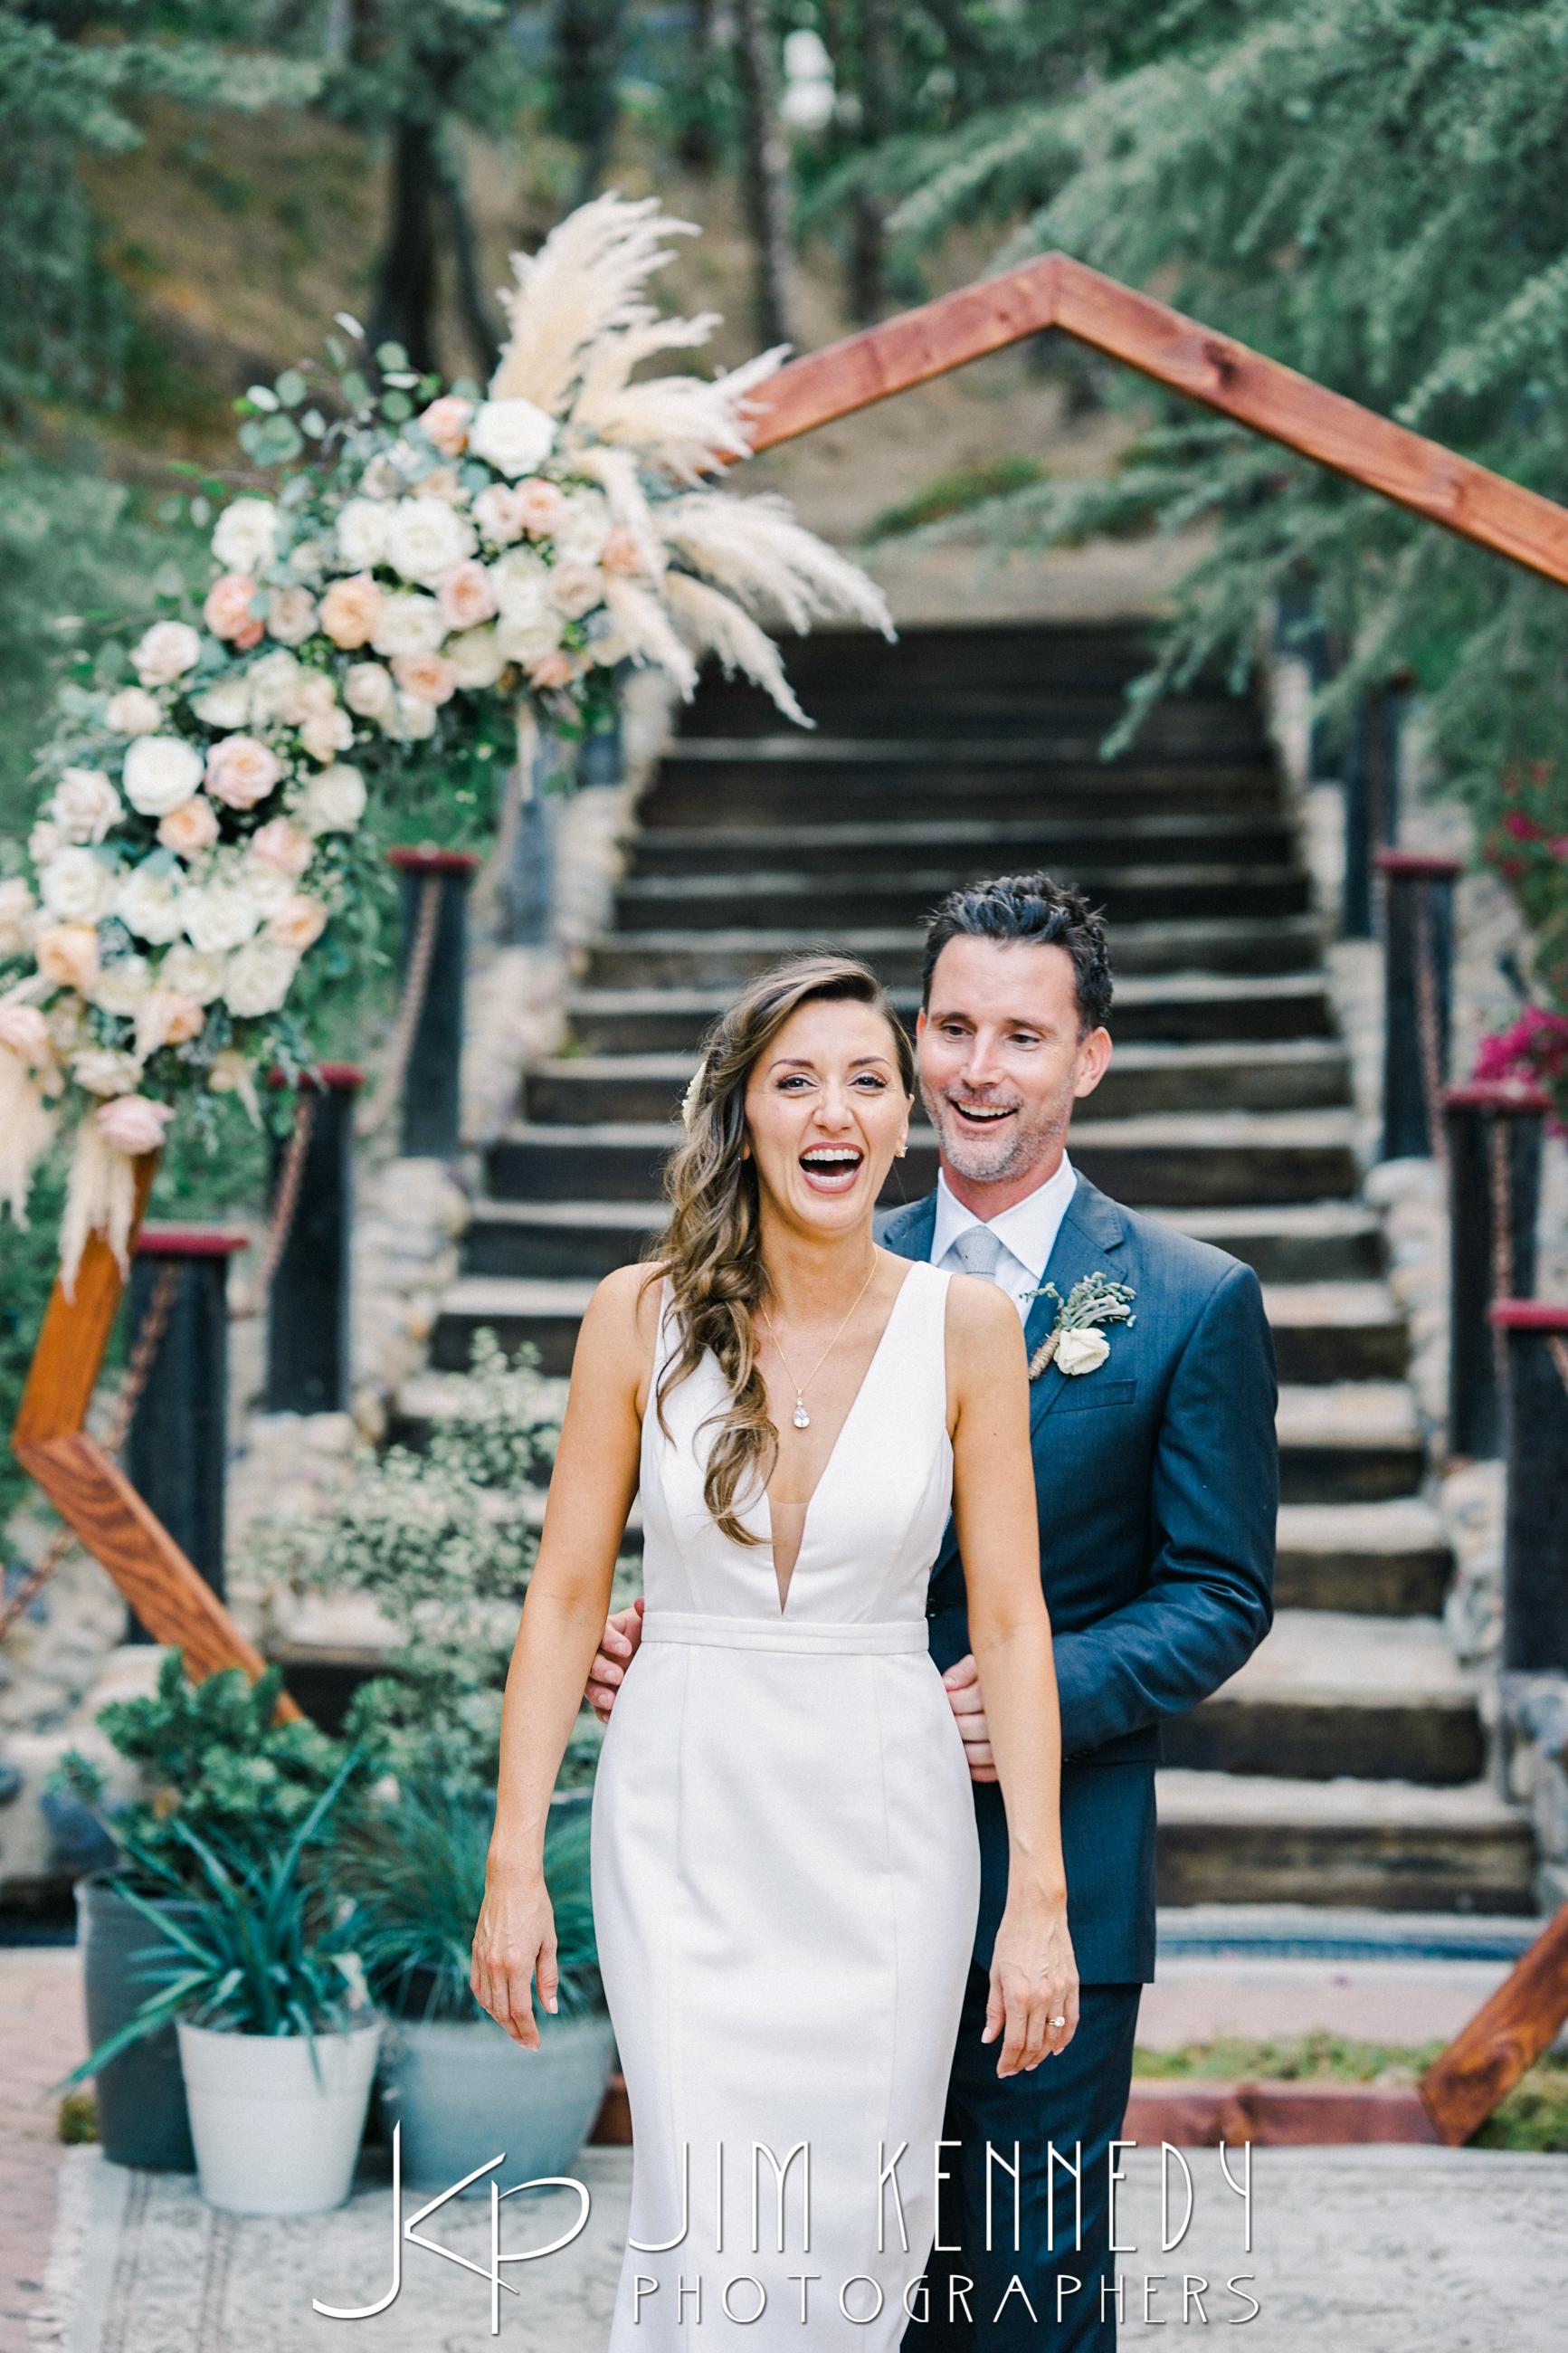 rancho_las_lomas_wedding_lauren_dylan_0162.JPG